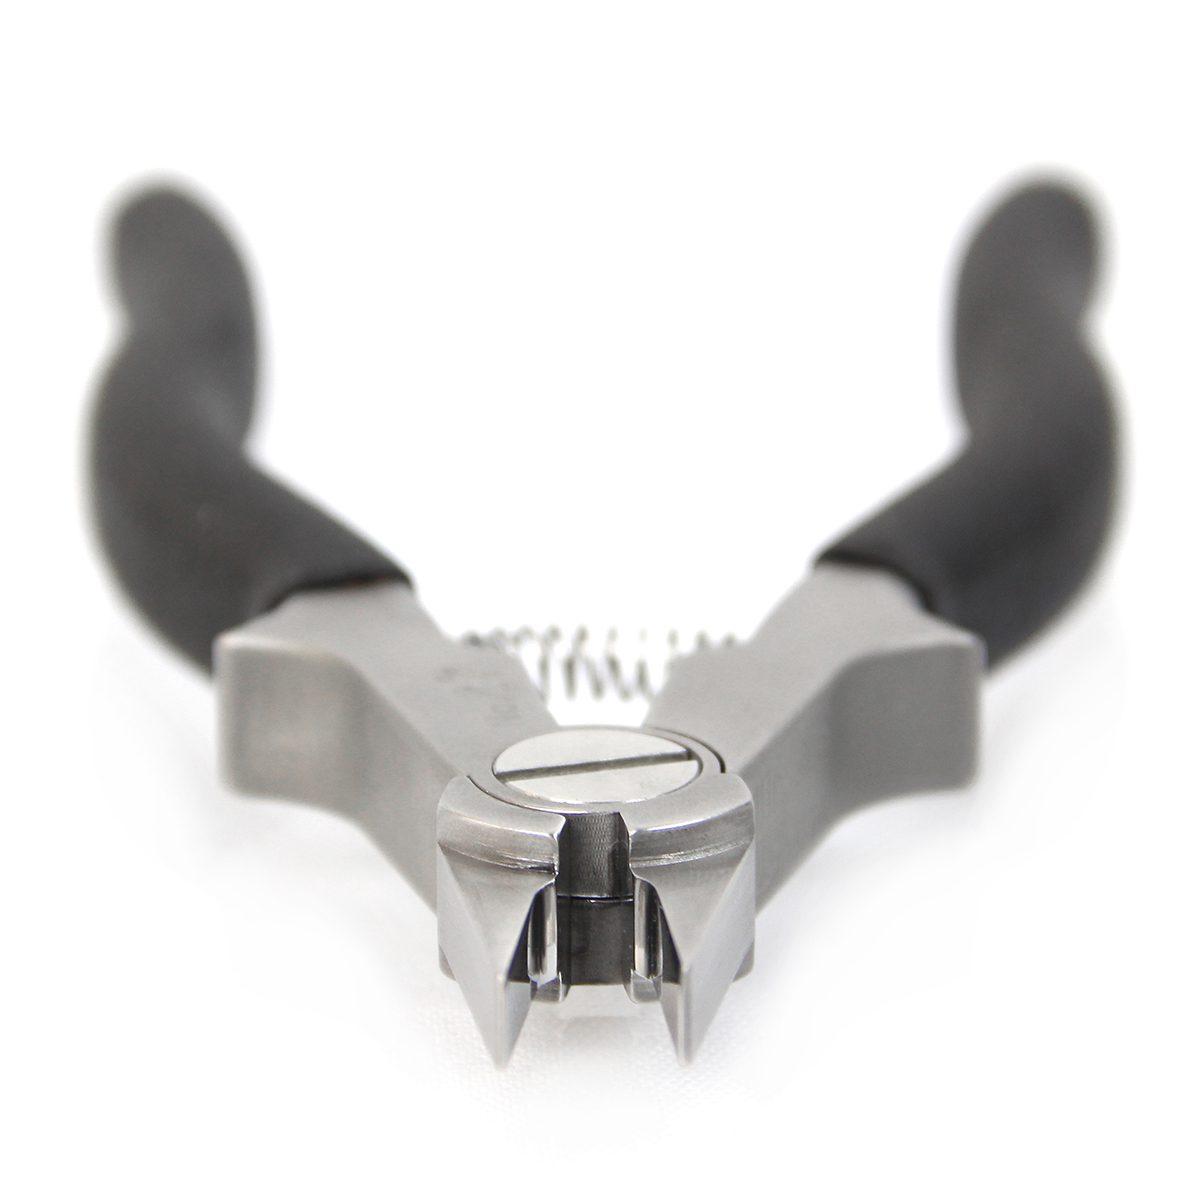 jls model 27 key arm and foot plier 1